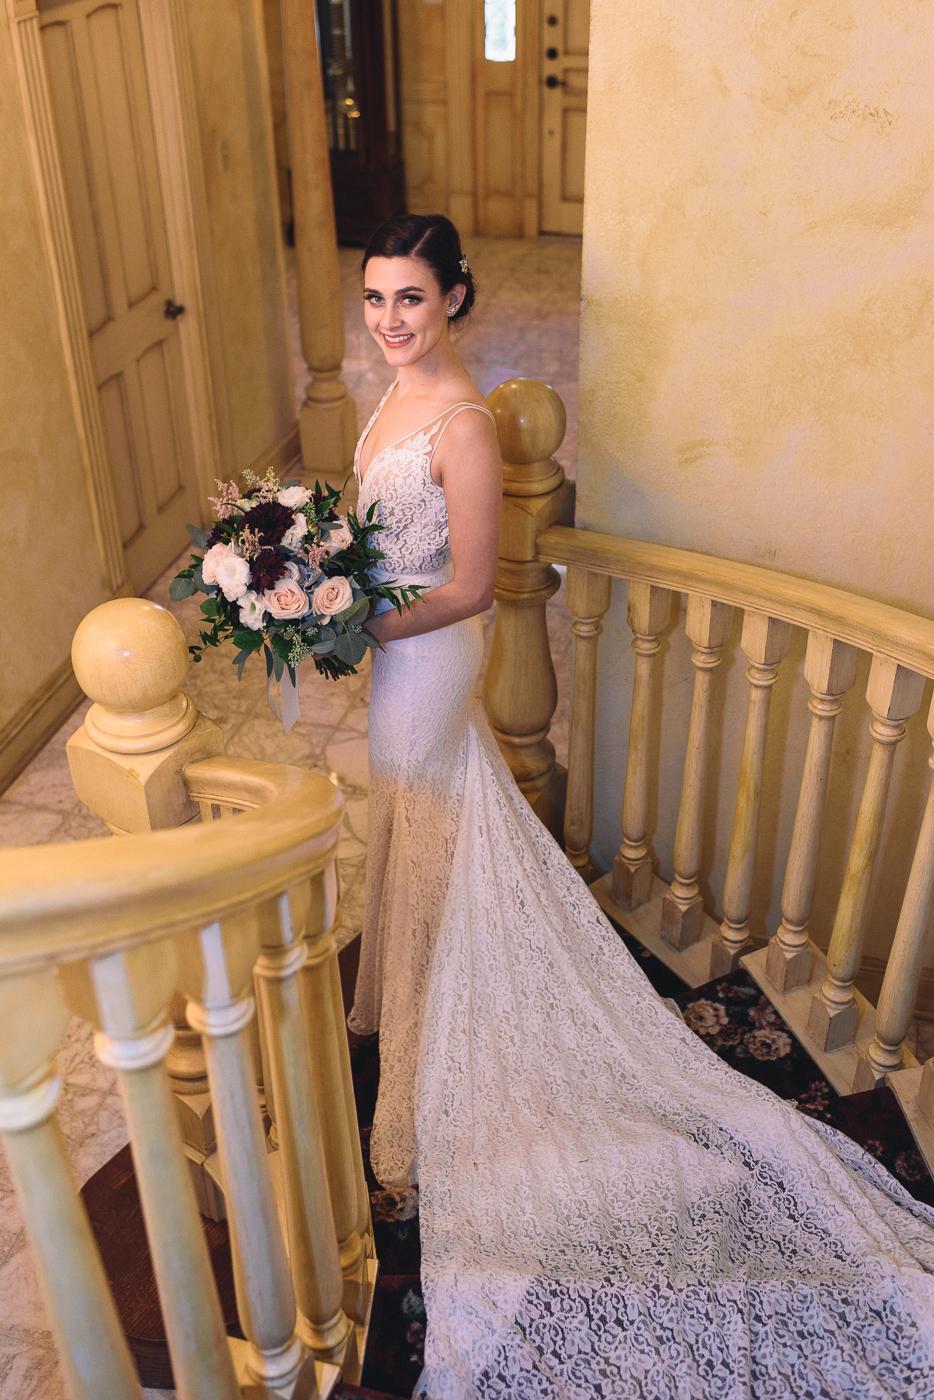 beautiful bride wedding gown bouquet lace train